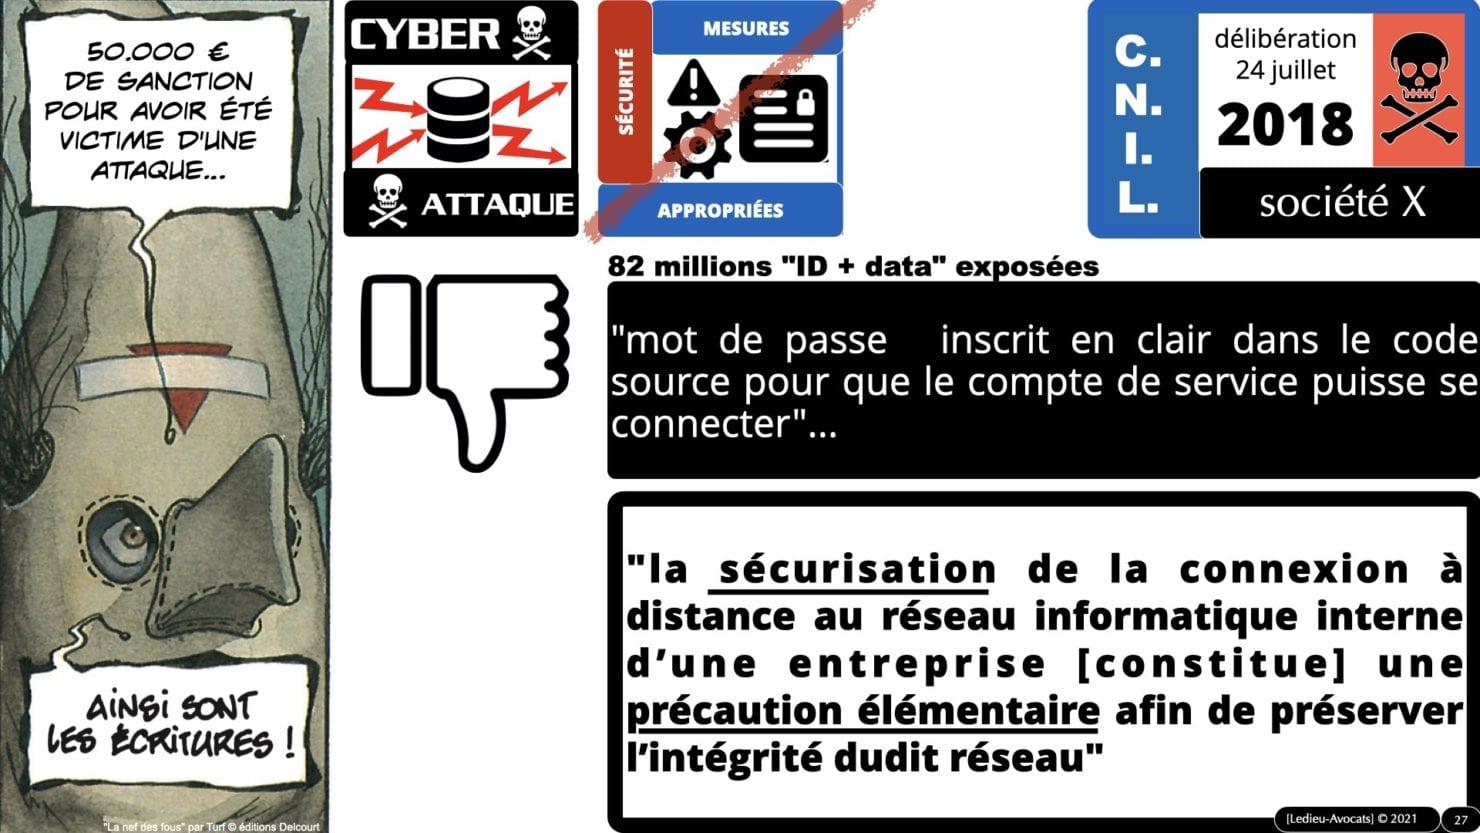 RGPD e-Privacy principes actualité jurisprudence ©Ledieu-Avocats 25-06-2021.027